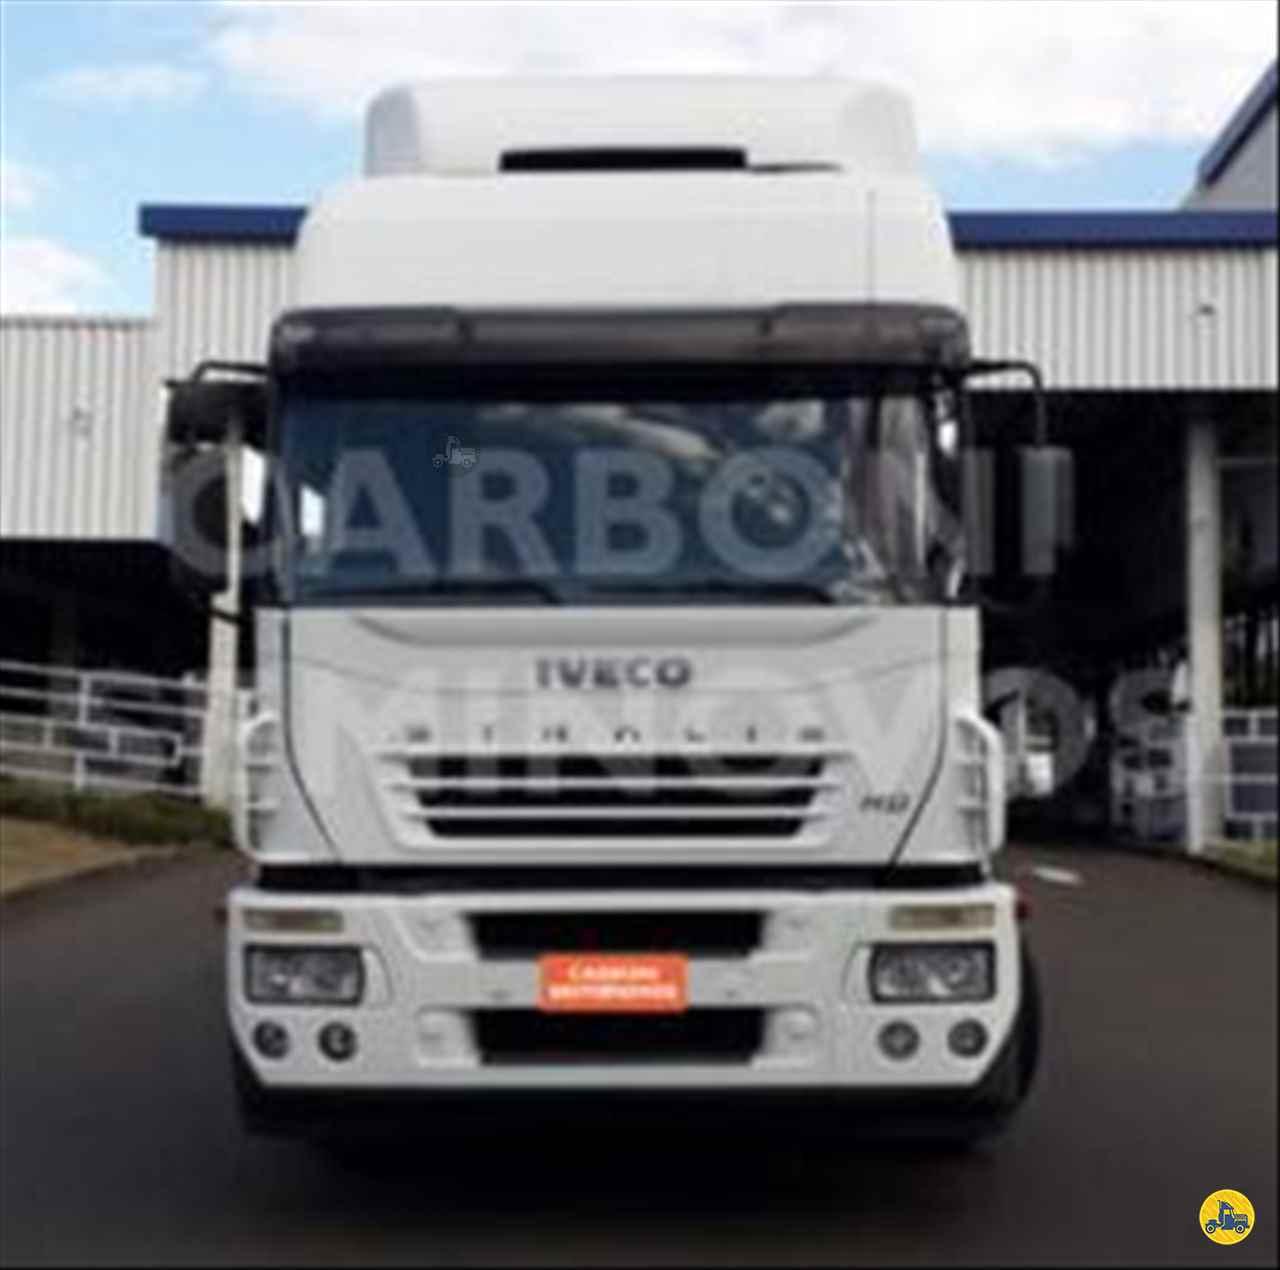 STRALIS 480 de Carboni Iveco - VIDEIRA/SC